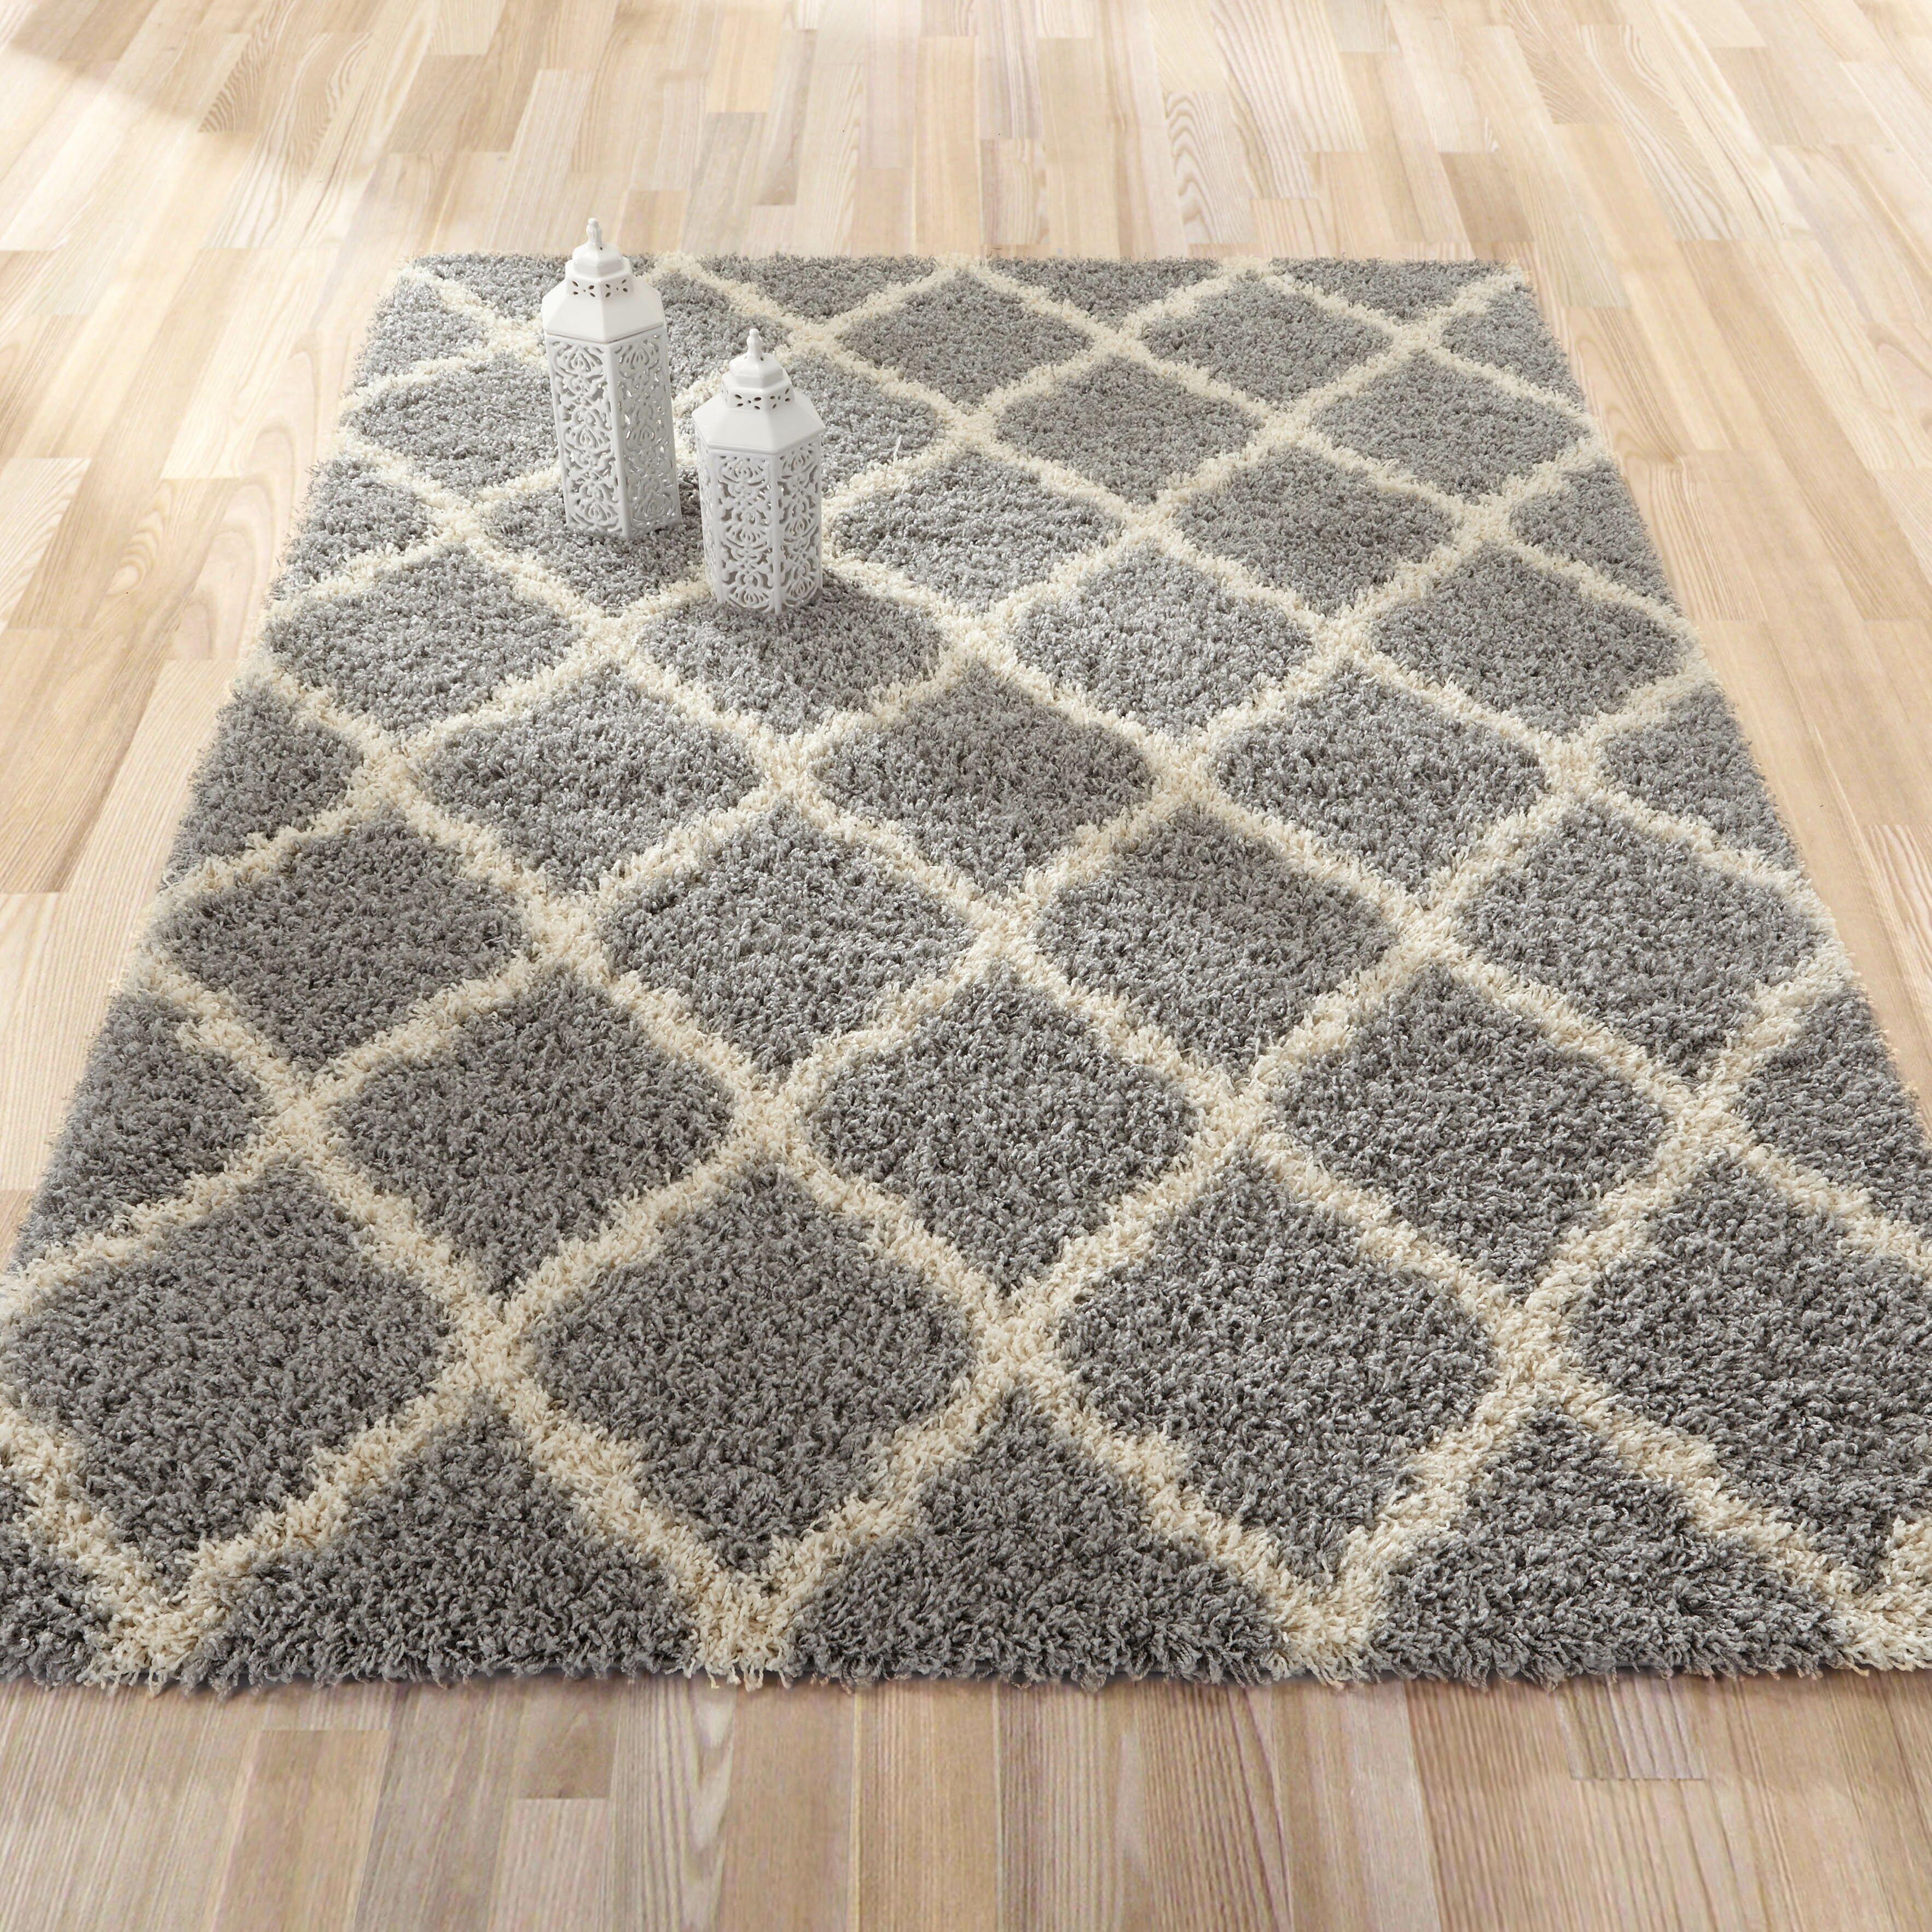 Shaggy Wool Rugs: Ottomanson Ultimate Moroccan Trellis Gray Shaggy Area Rug